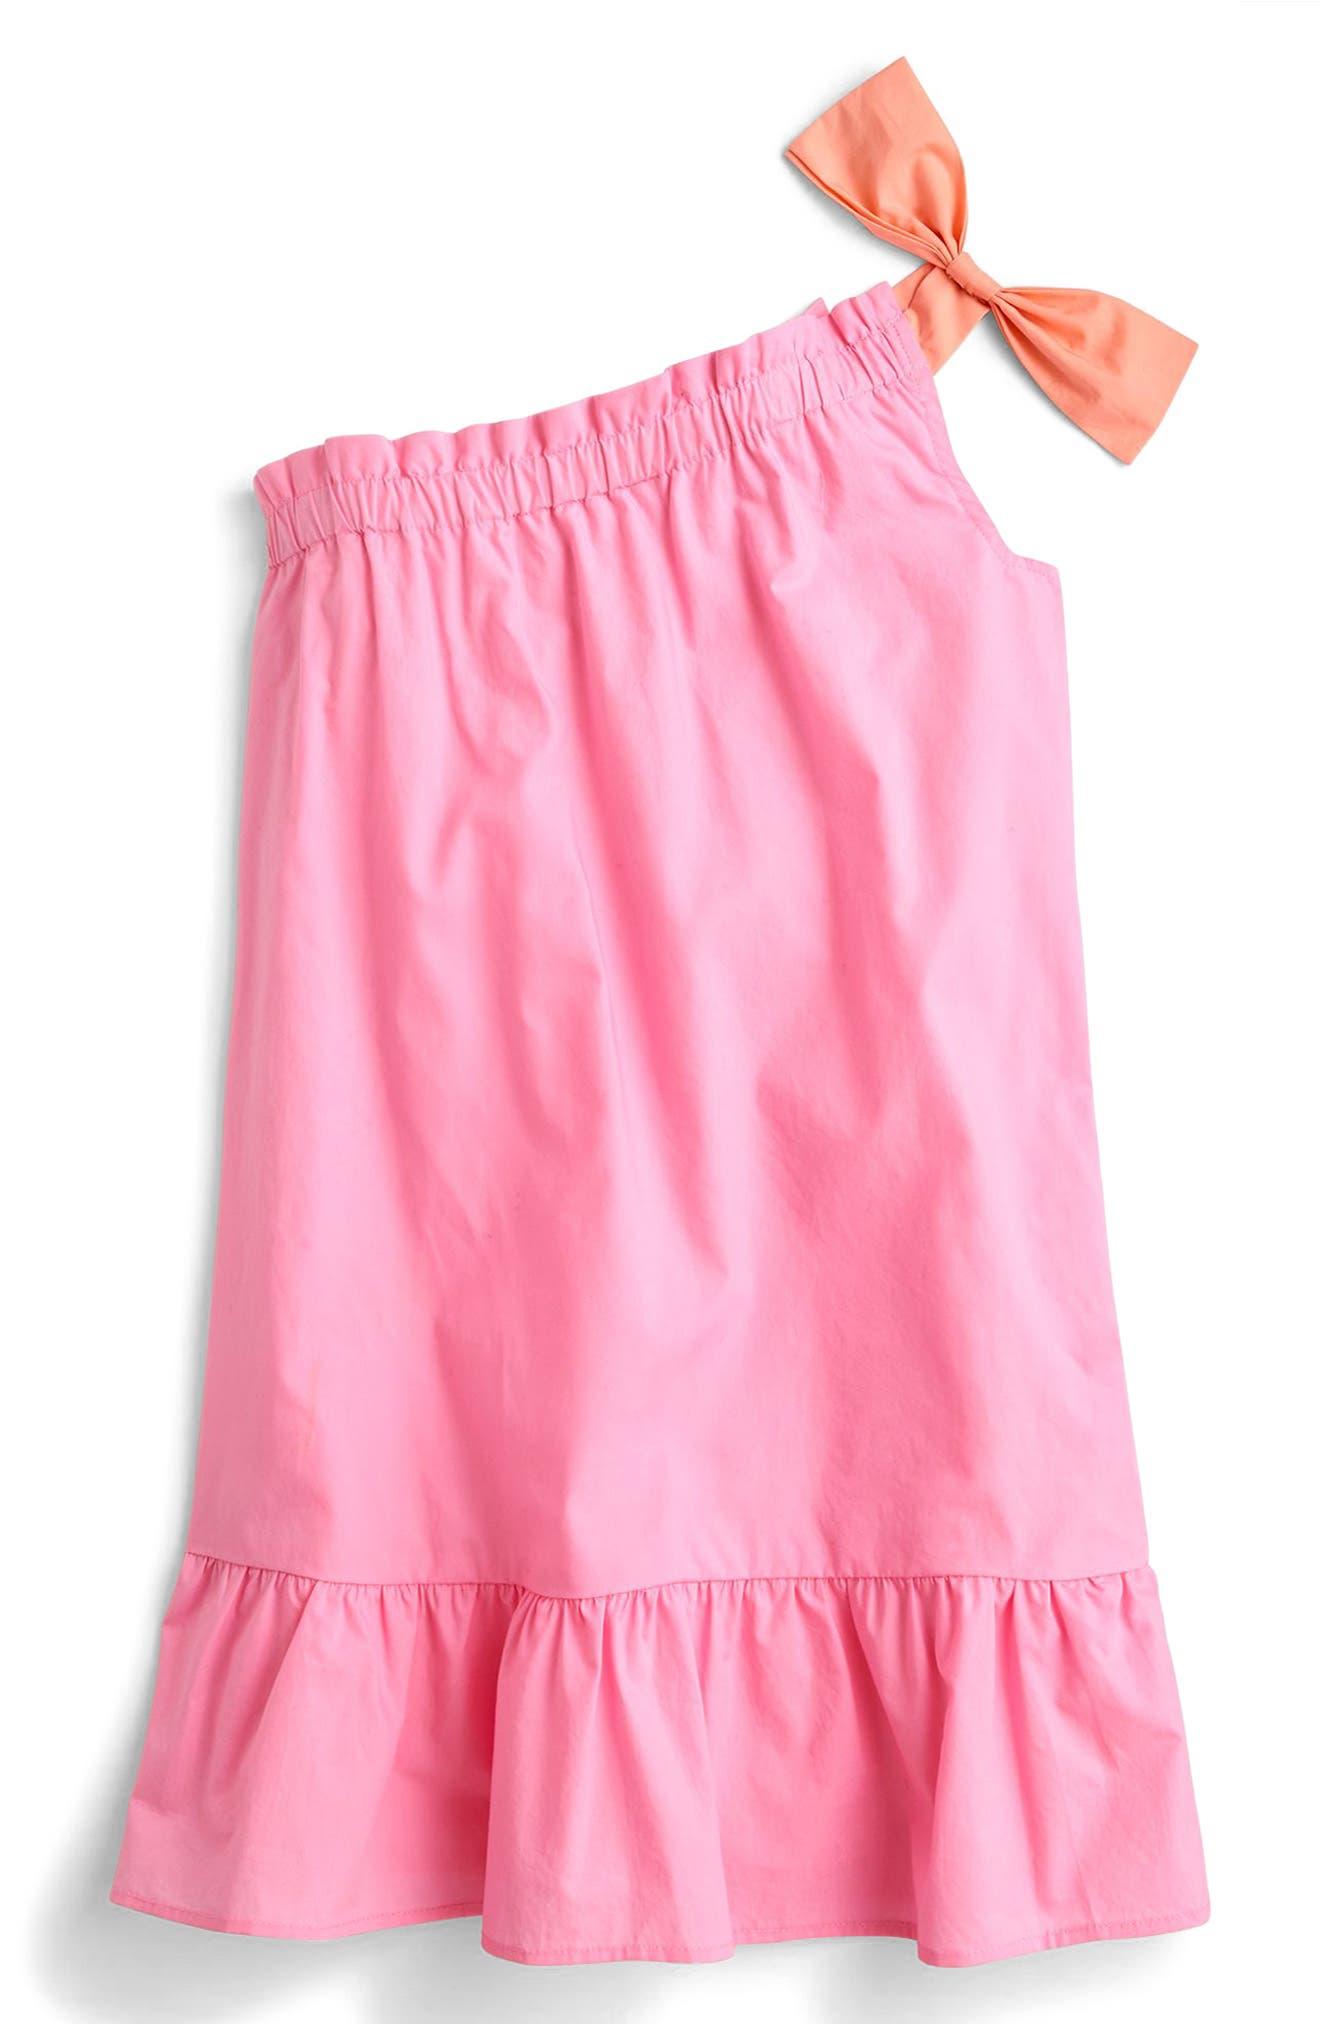 crewcuts by J. Crew Calpurnia One-Shoulder Dress (Toddler Girls, Little Girls & Big Girls)